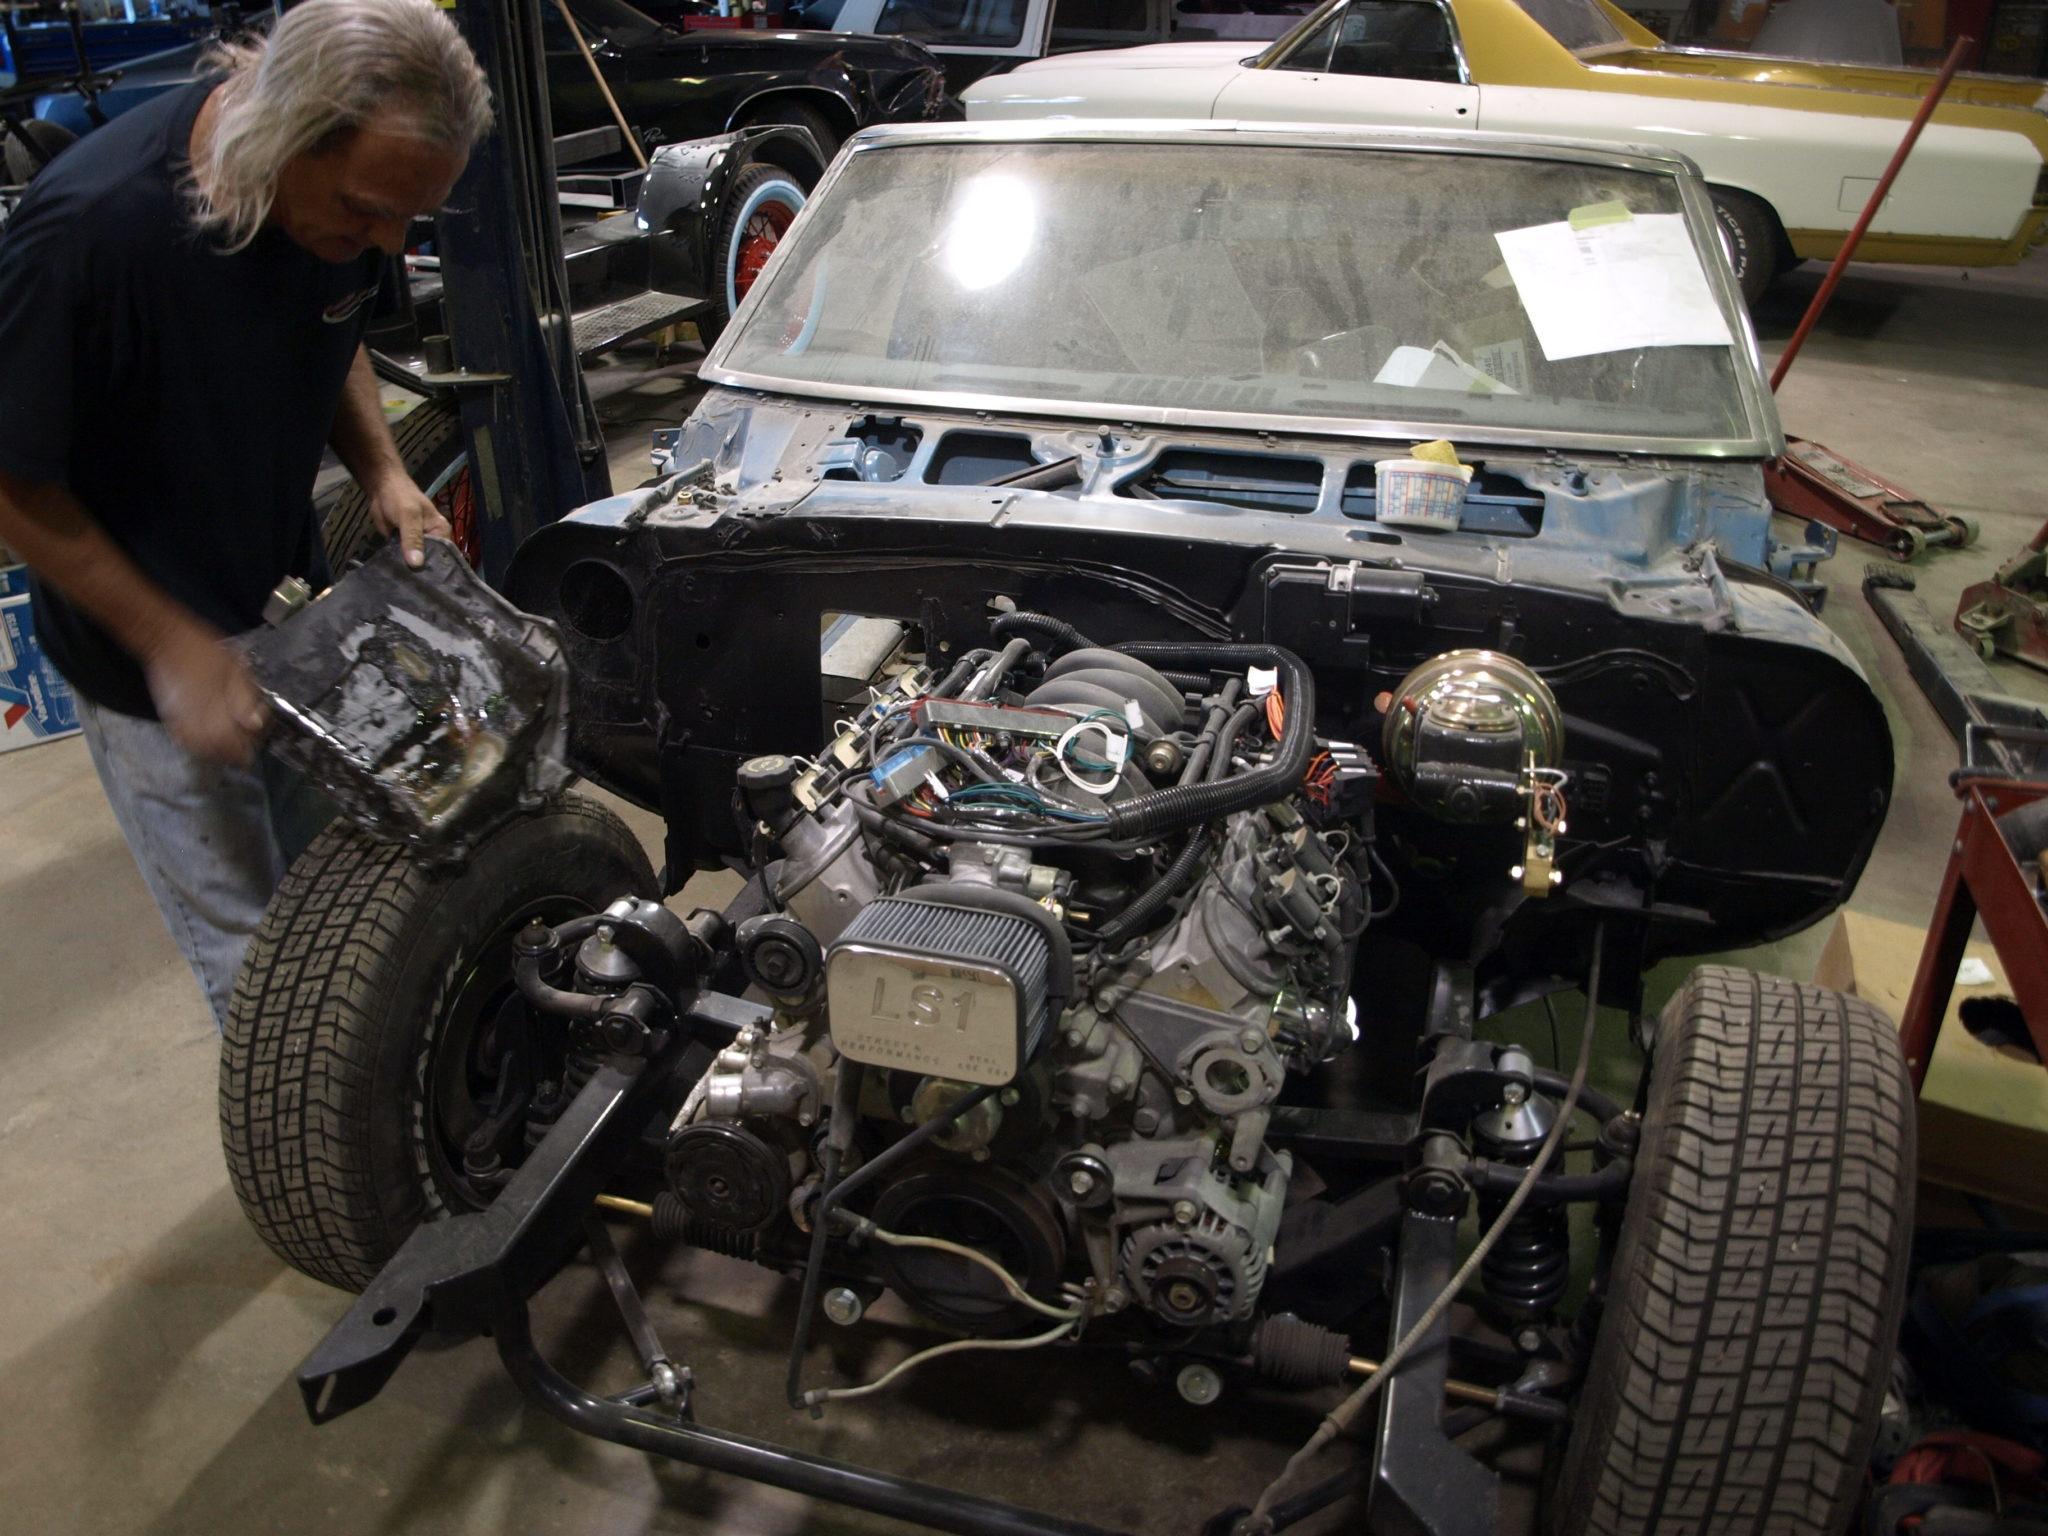 P7127050 1967 chevy camaro precision car restoration 1967 camaro fuse box at alyssarenee.co